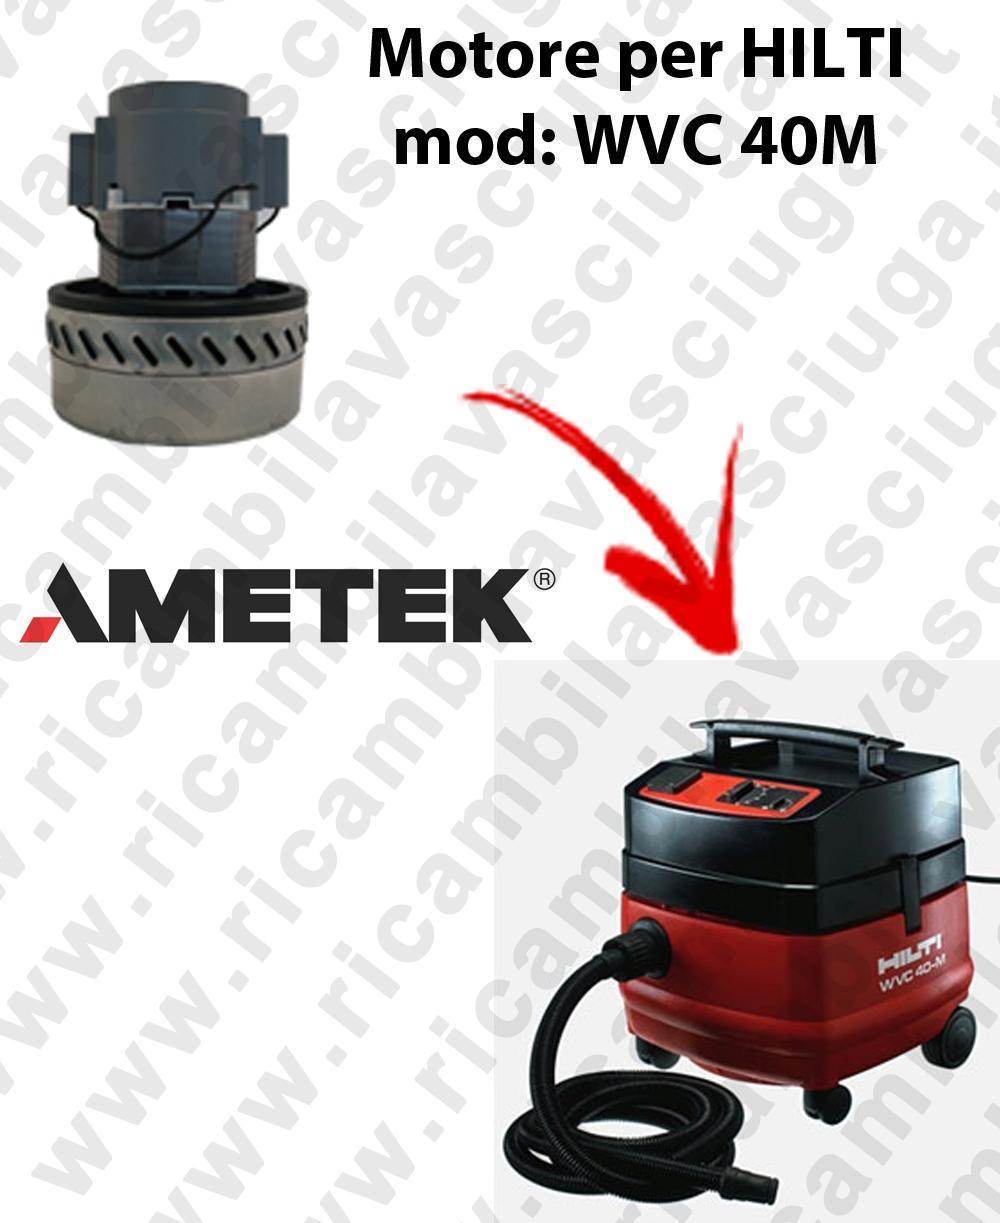 WVC 40 M Motore de aspiración AMETEK  para aspiradora HILTI